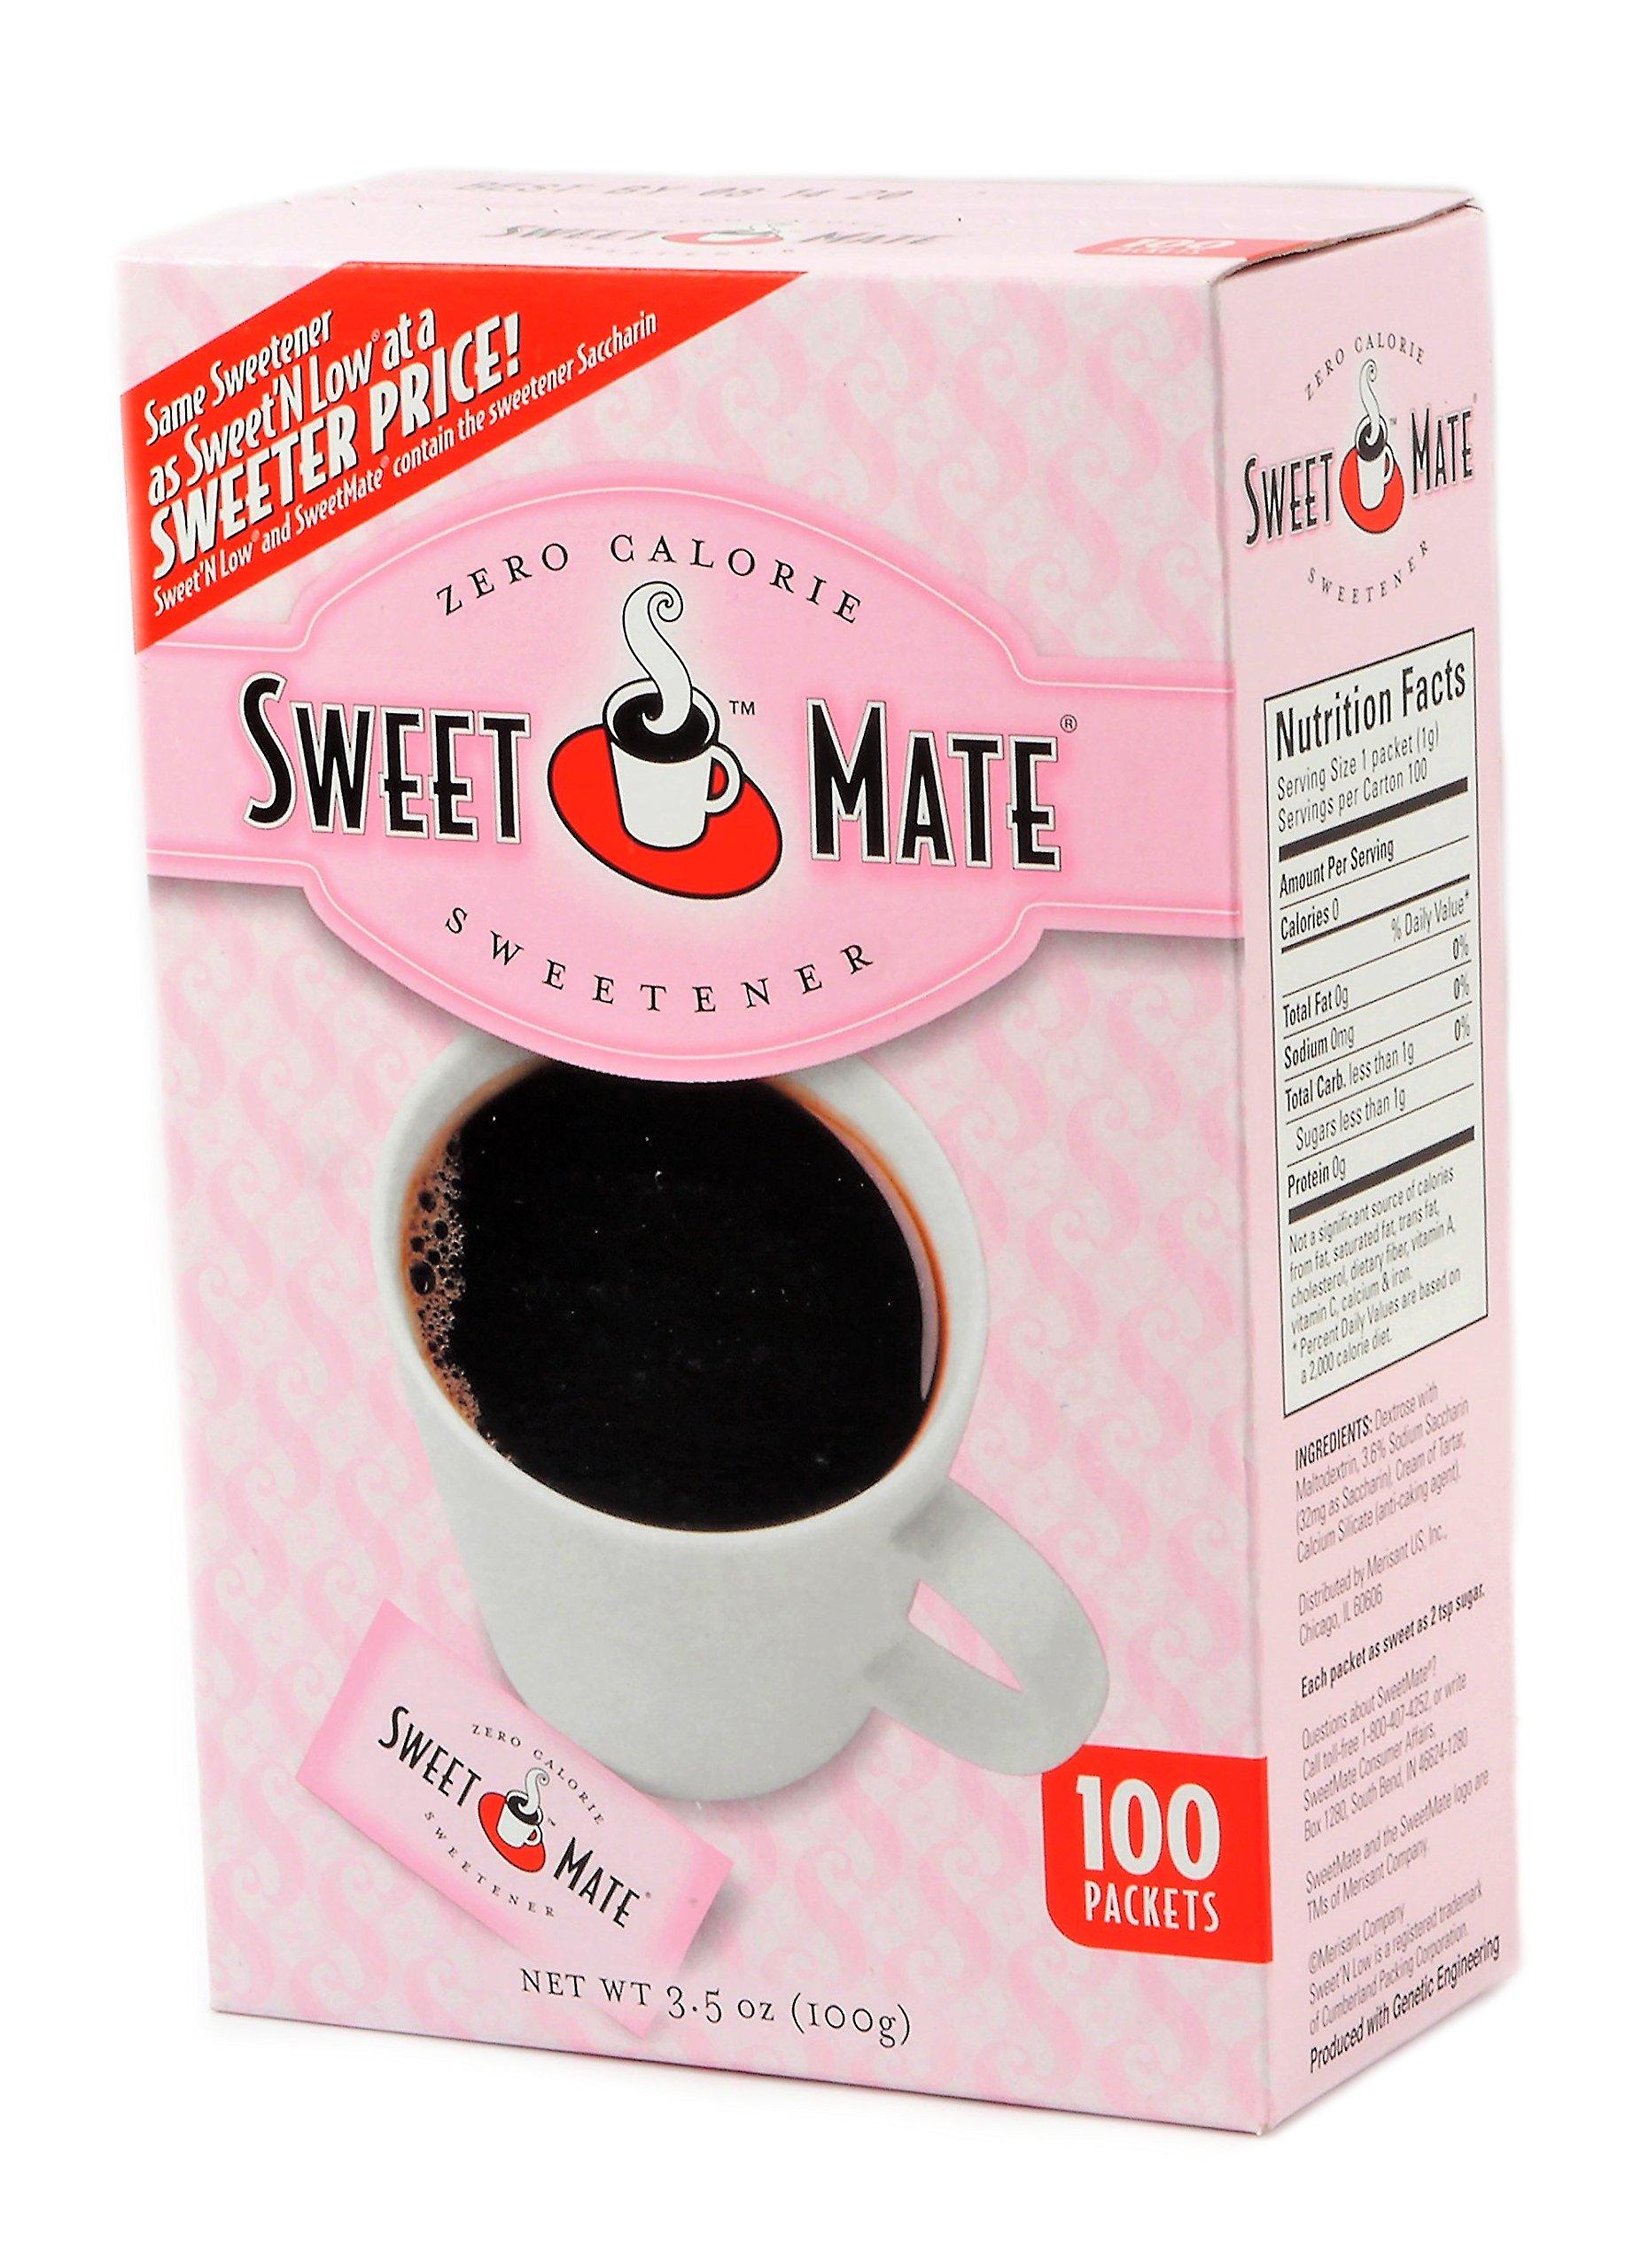 Sweet Mate Sweetener Zero Calories, Saccharine, Pink, 100-Count, 4Pk